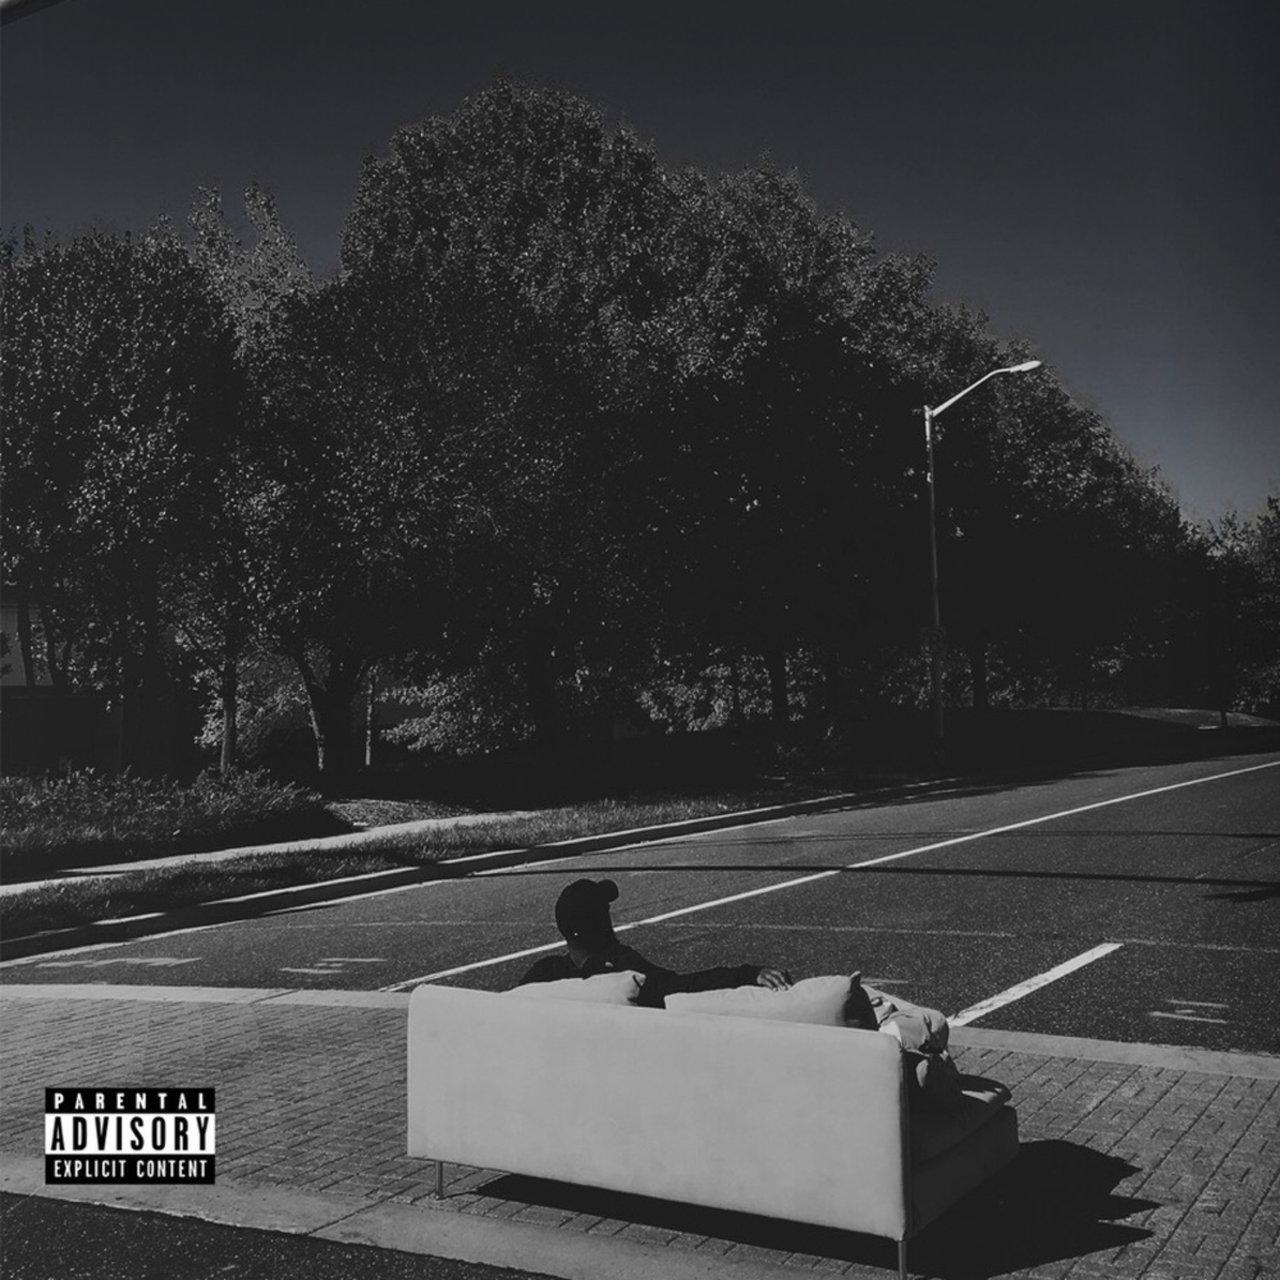 G'Town Wayne – 'Worthwhile' (Stream)